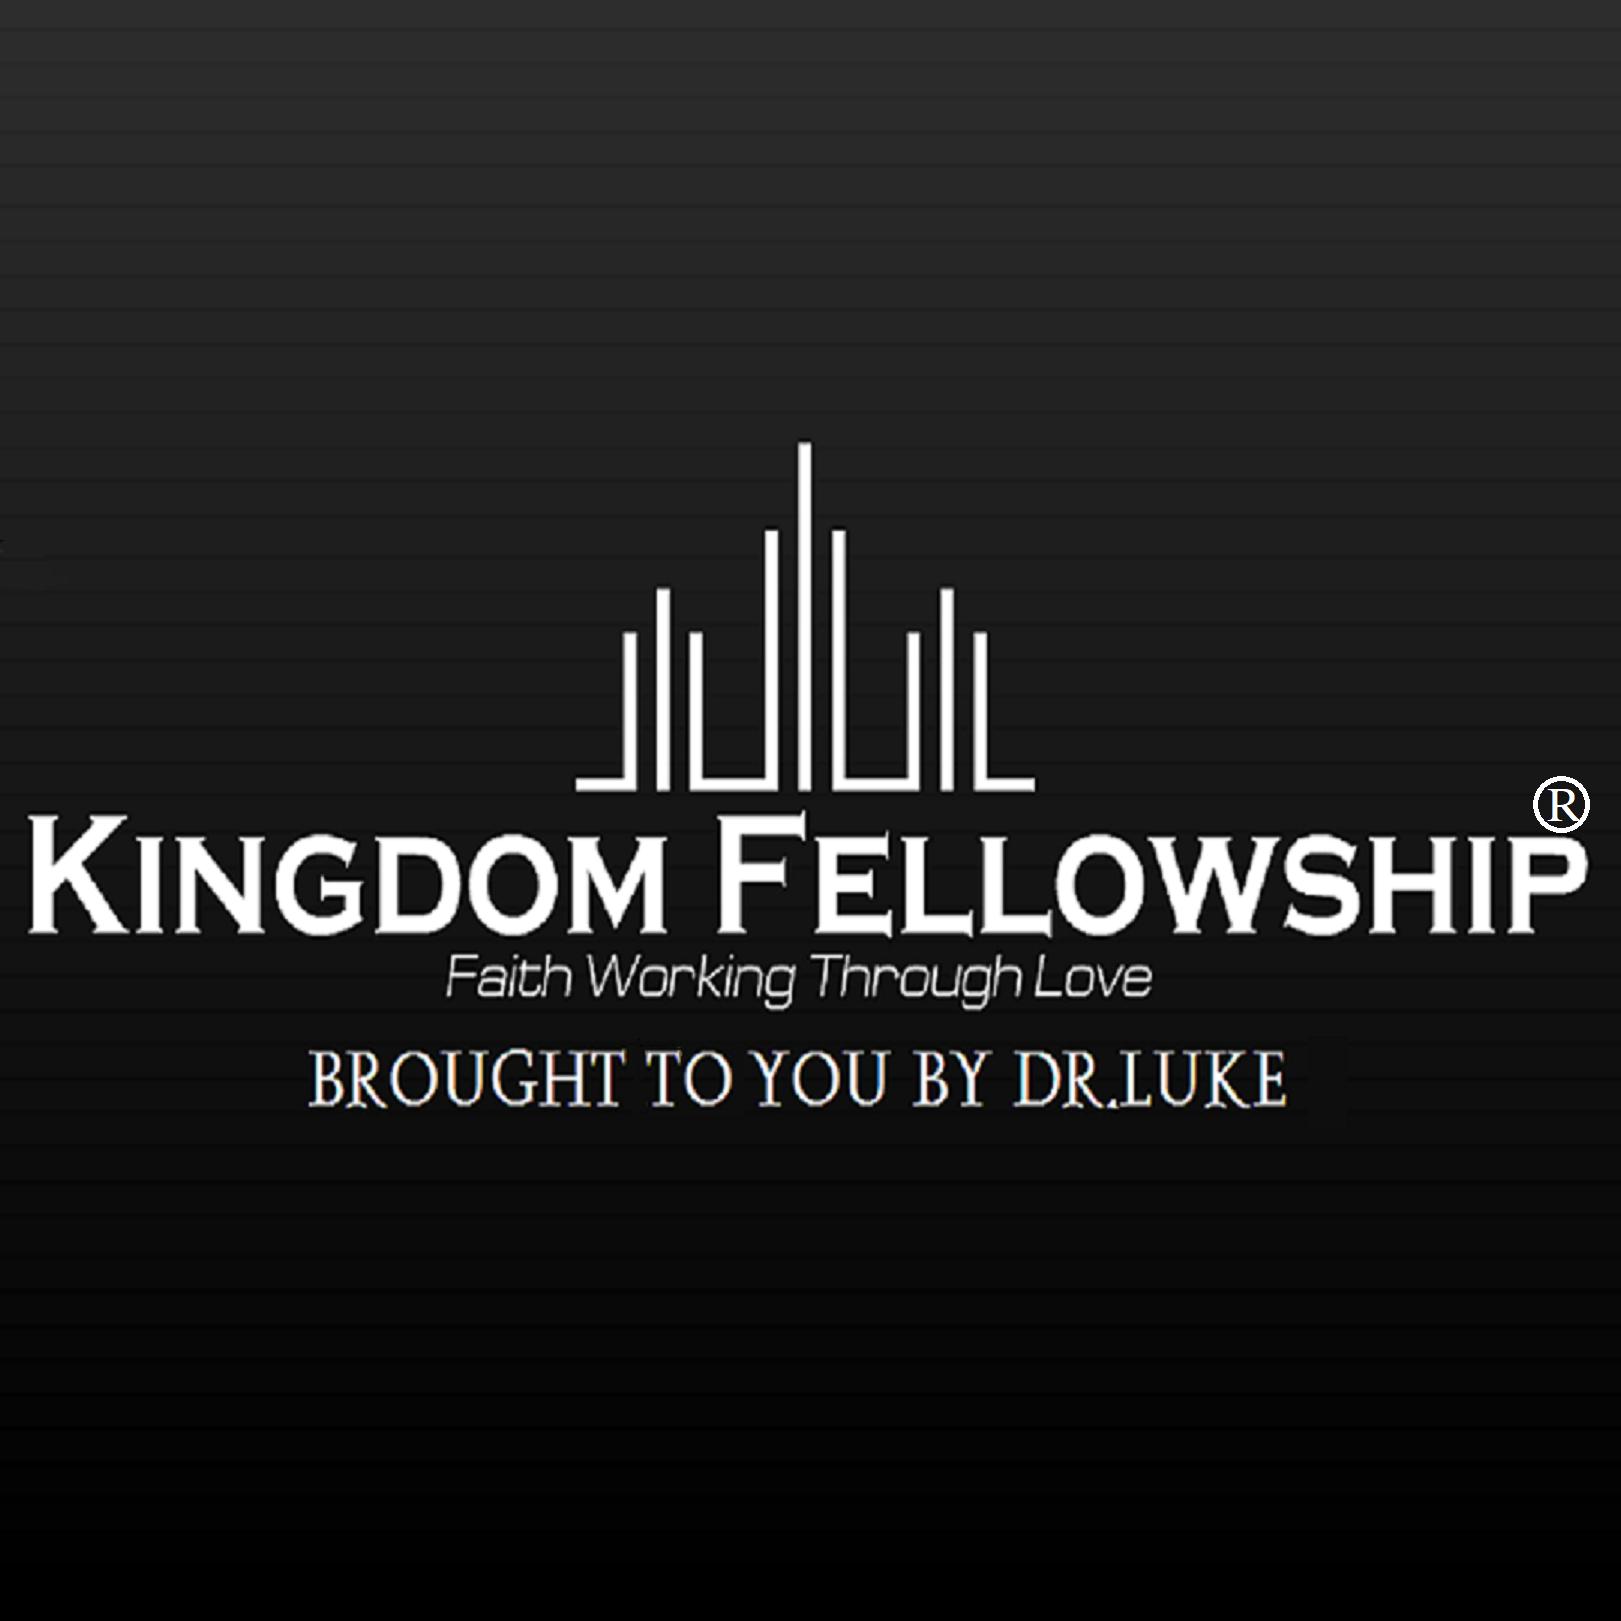 Kingdom Fellowship Celebration